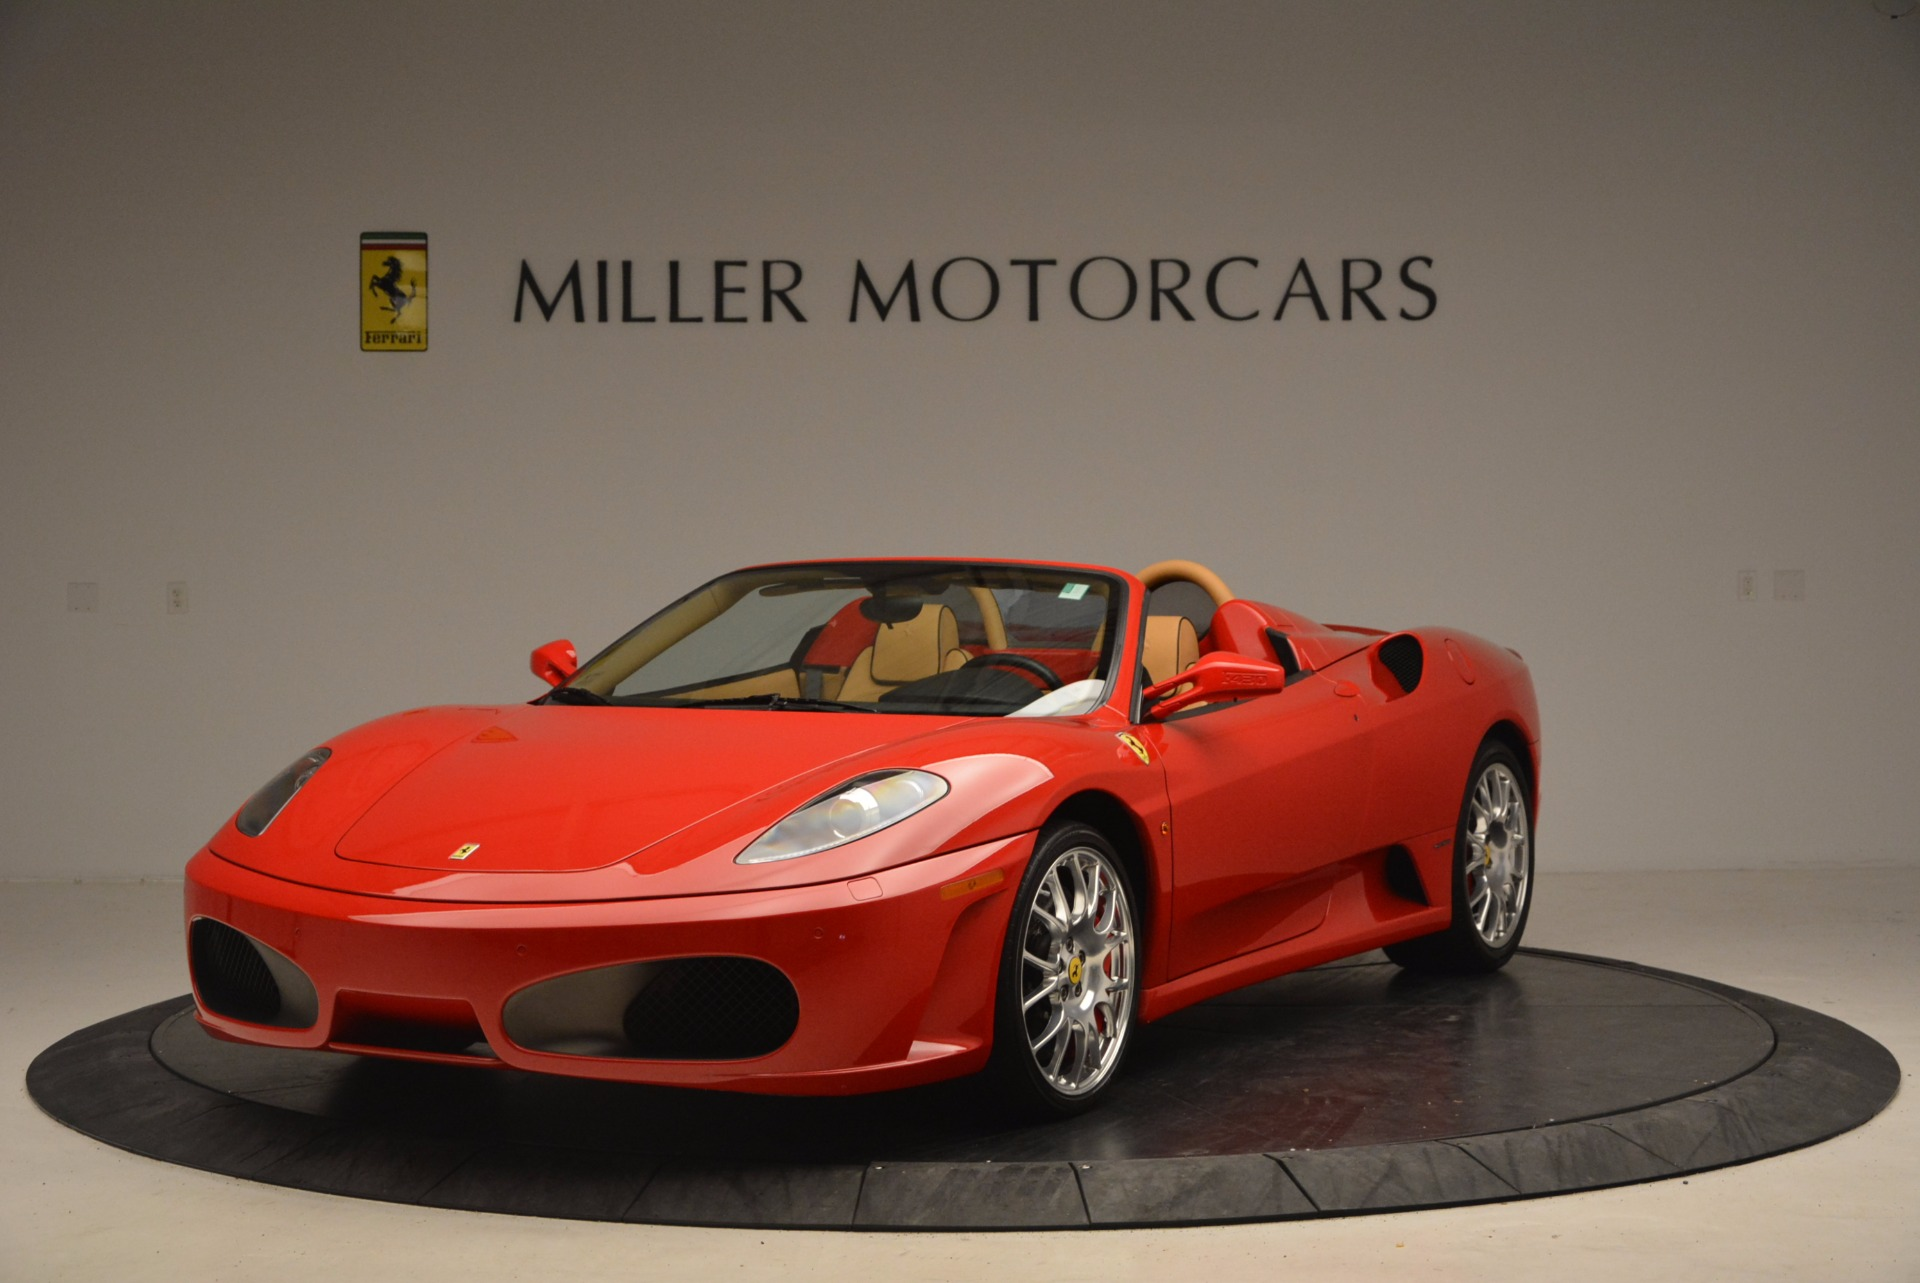 Used 2008 Ferrari F430 Spider for sale Sold at Maserati of Greenwich in Greenwich CT 06830 1